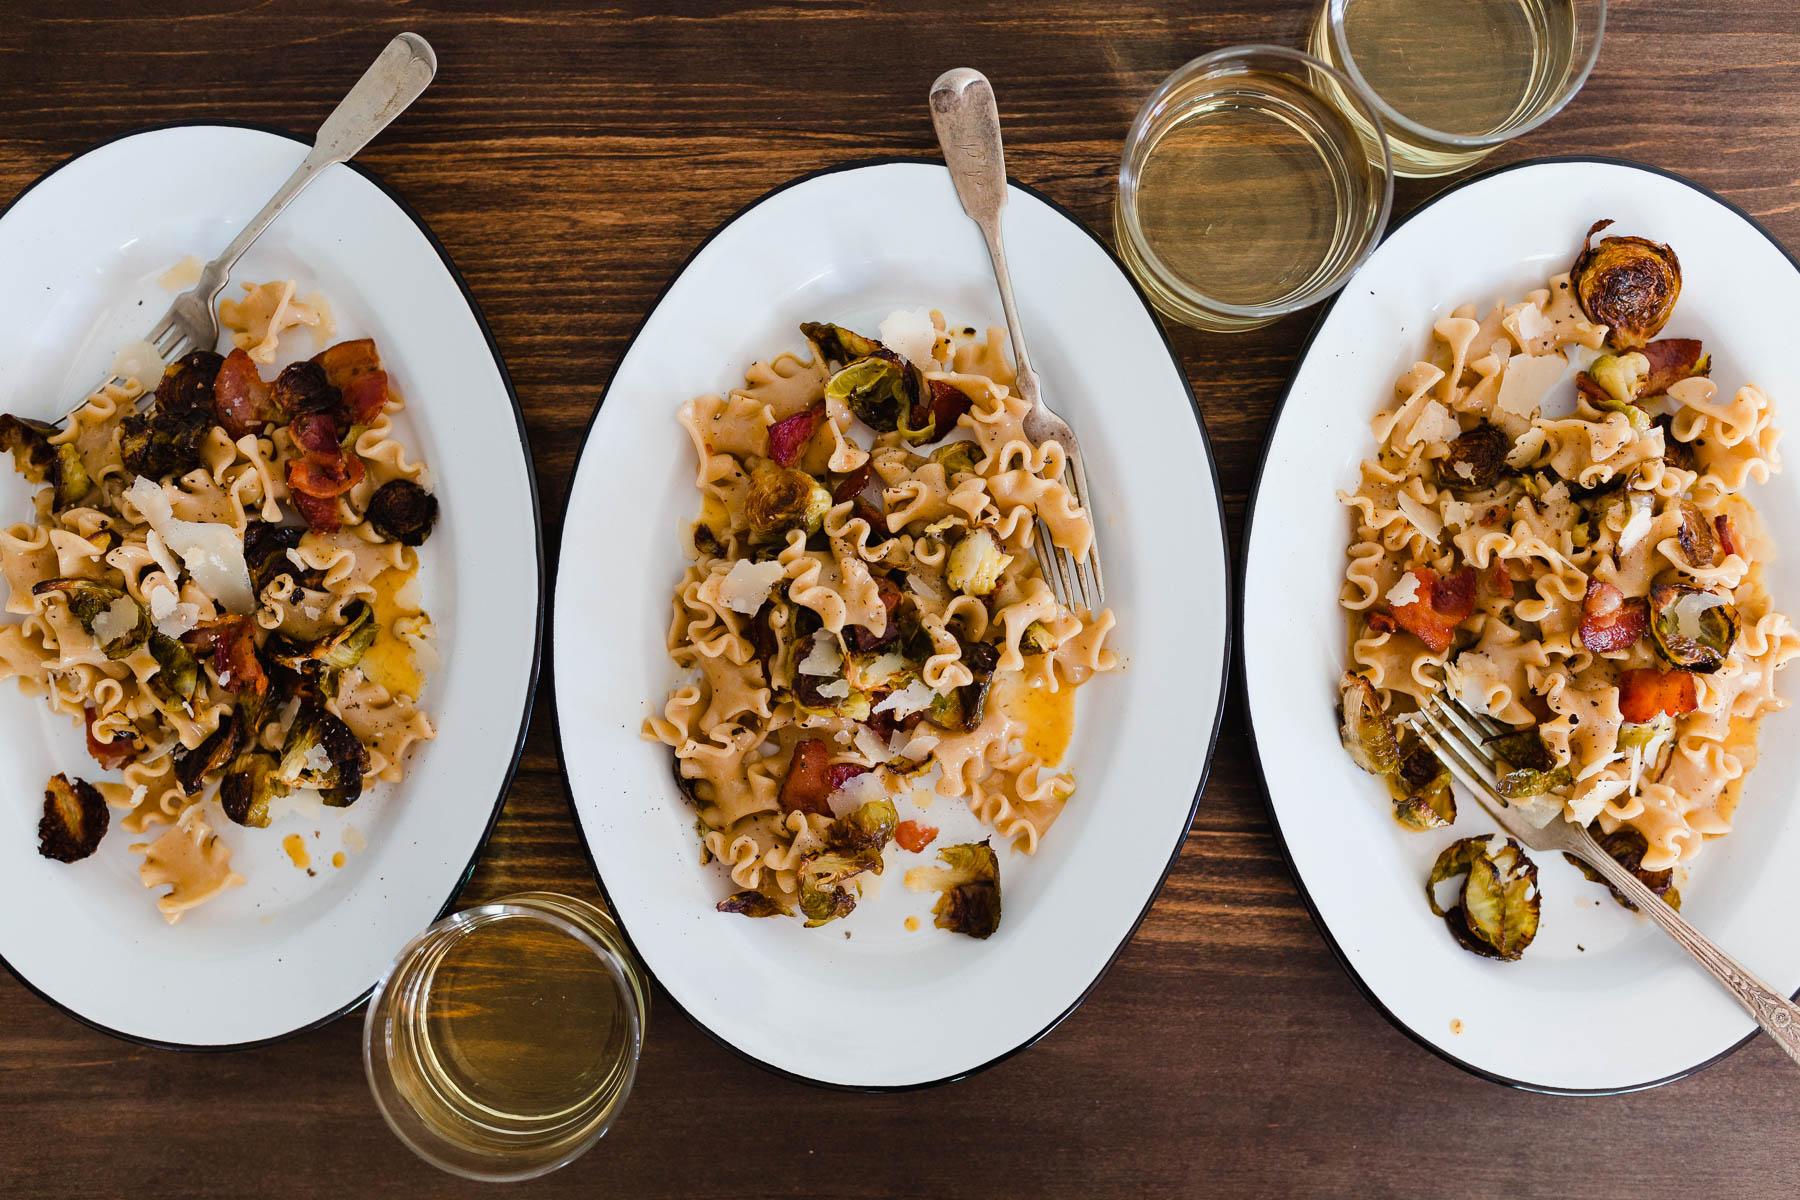 chicago-nyc-food-lifestyle-photographer-2.jpg